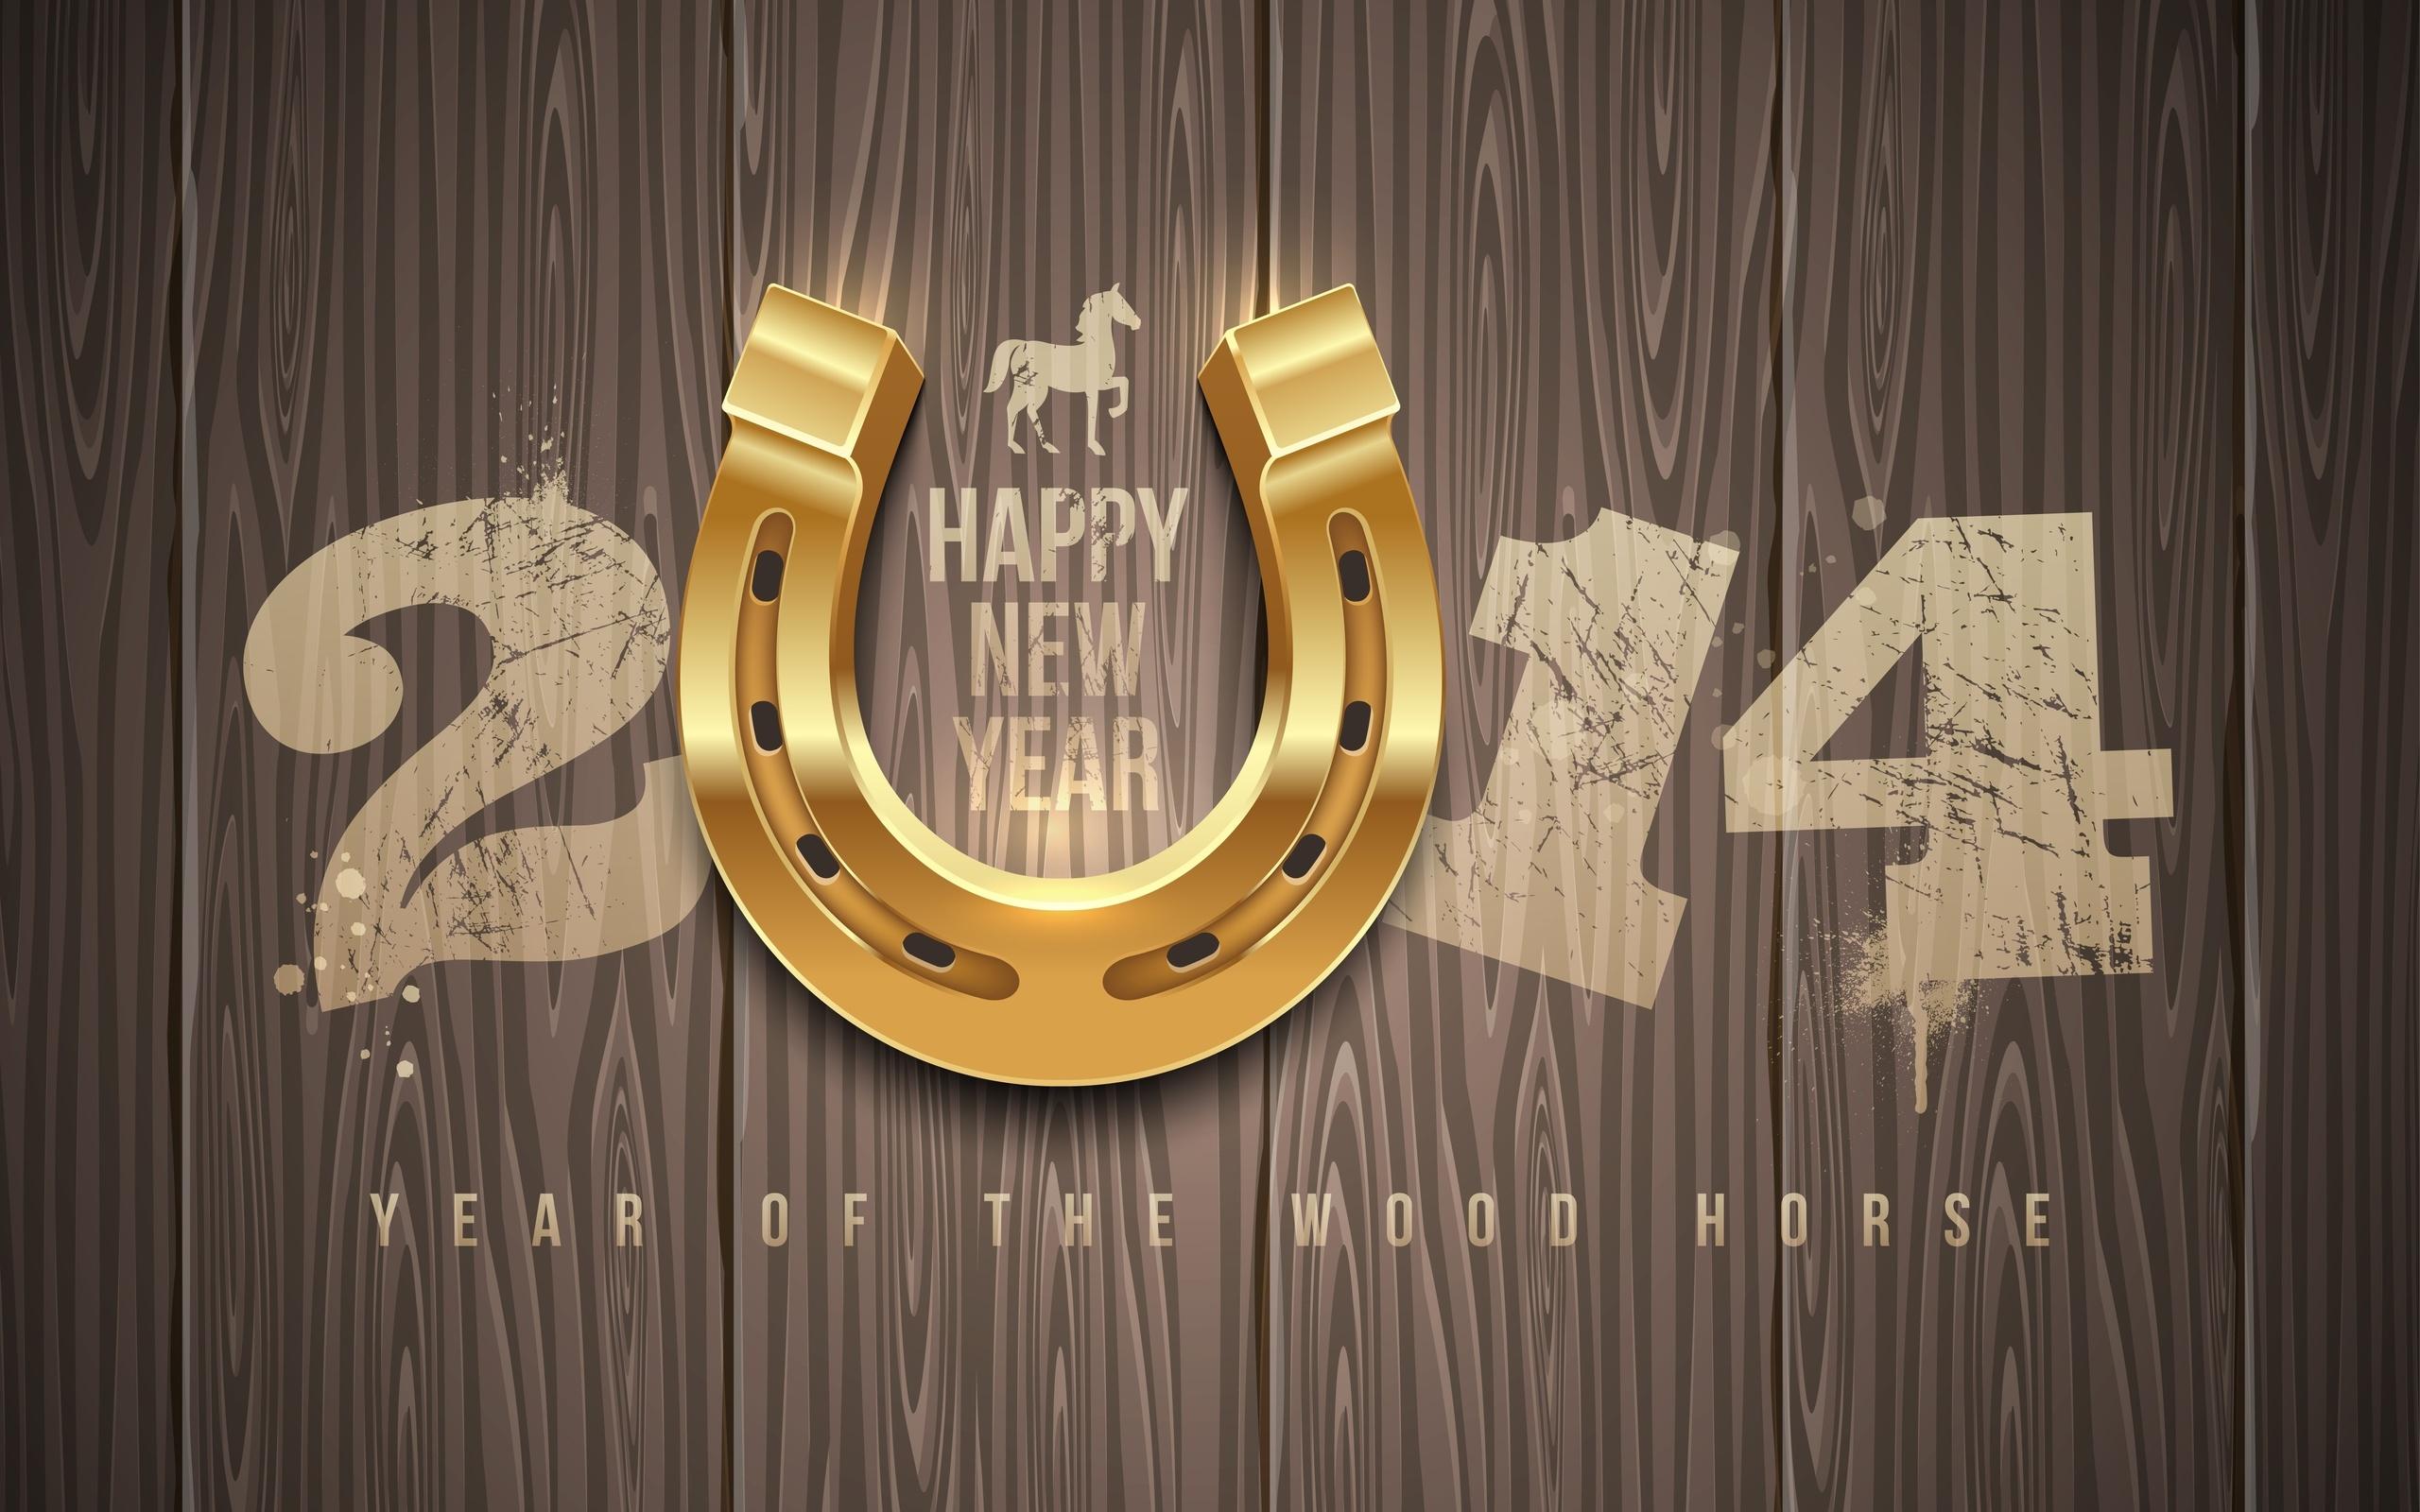 554102_god_loshadi_happy_new_year_novyiy_god_2014_2560x1600_(www_GdeFon_ru).jpg